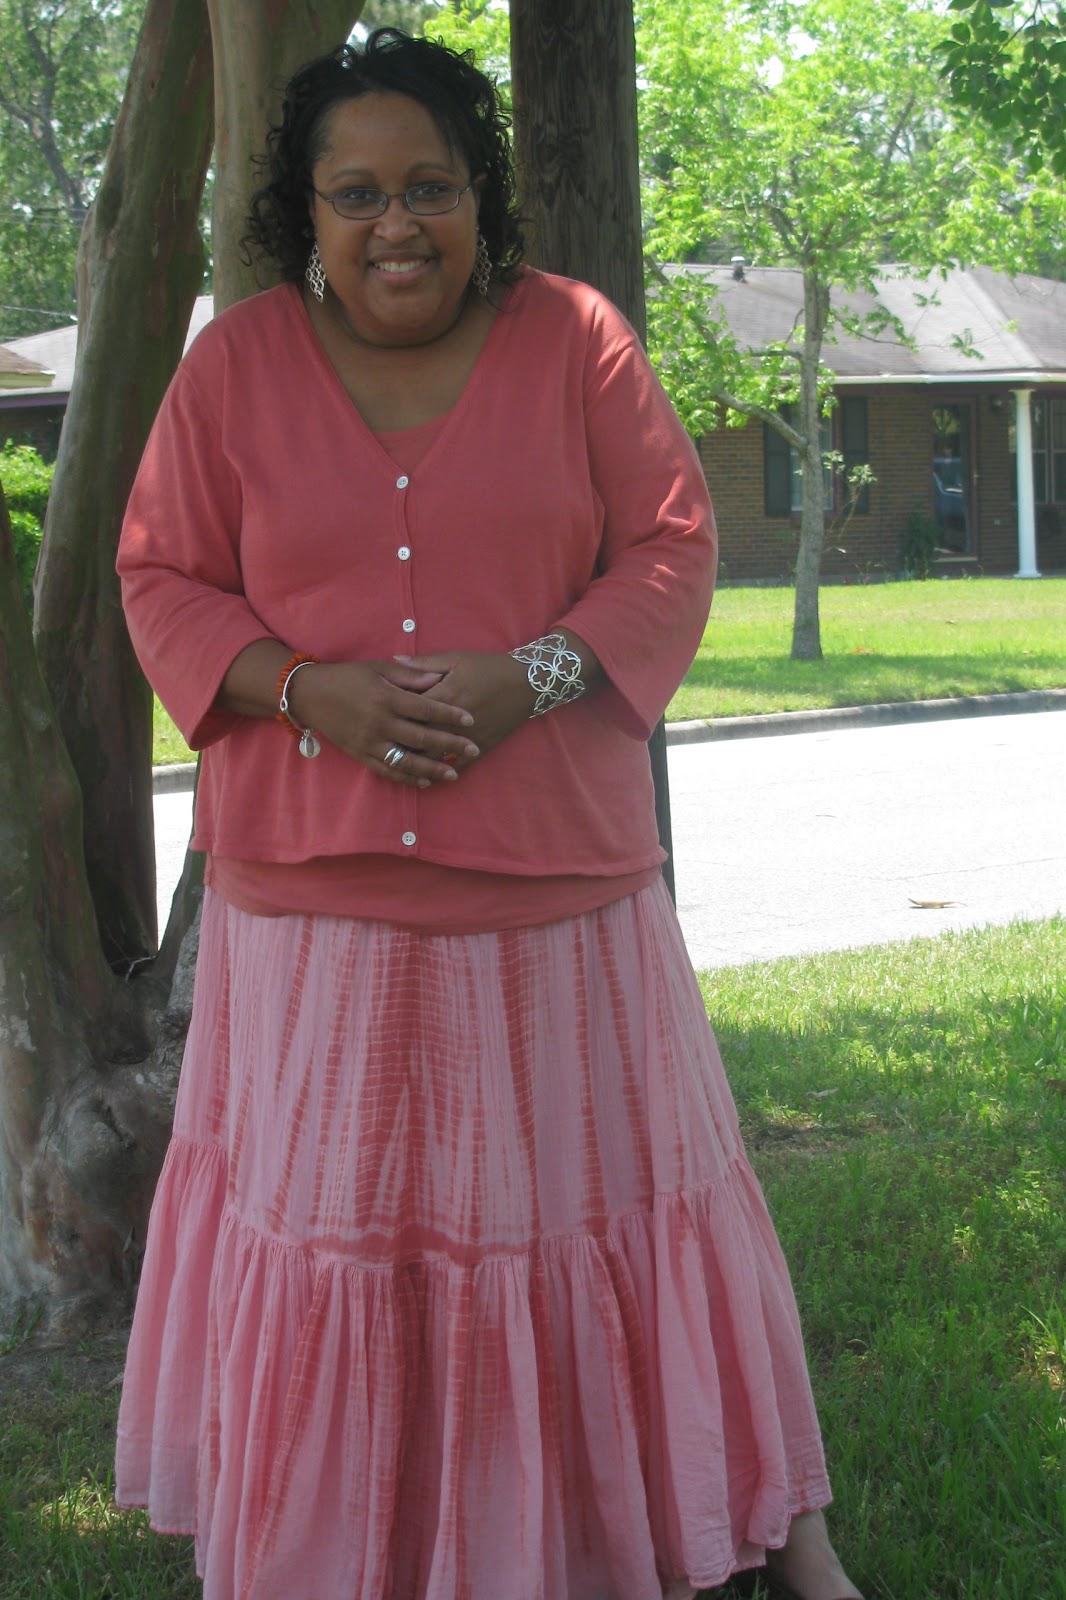 http://4.bp.blogspot.com/-IKwsMD9Vgno/TccjT3I2paI/AAAAAAAABAE/kj6RbuRR8iw/s1600/MothersDay2011%2B13.JPG